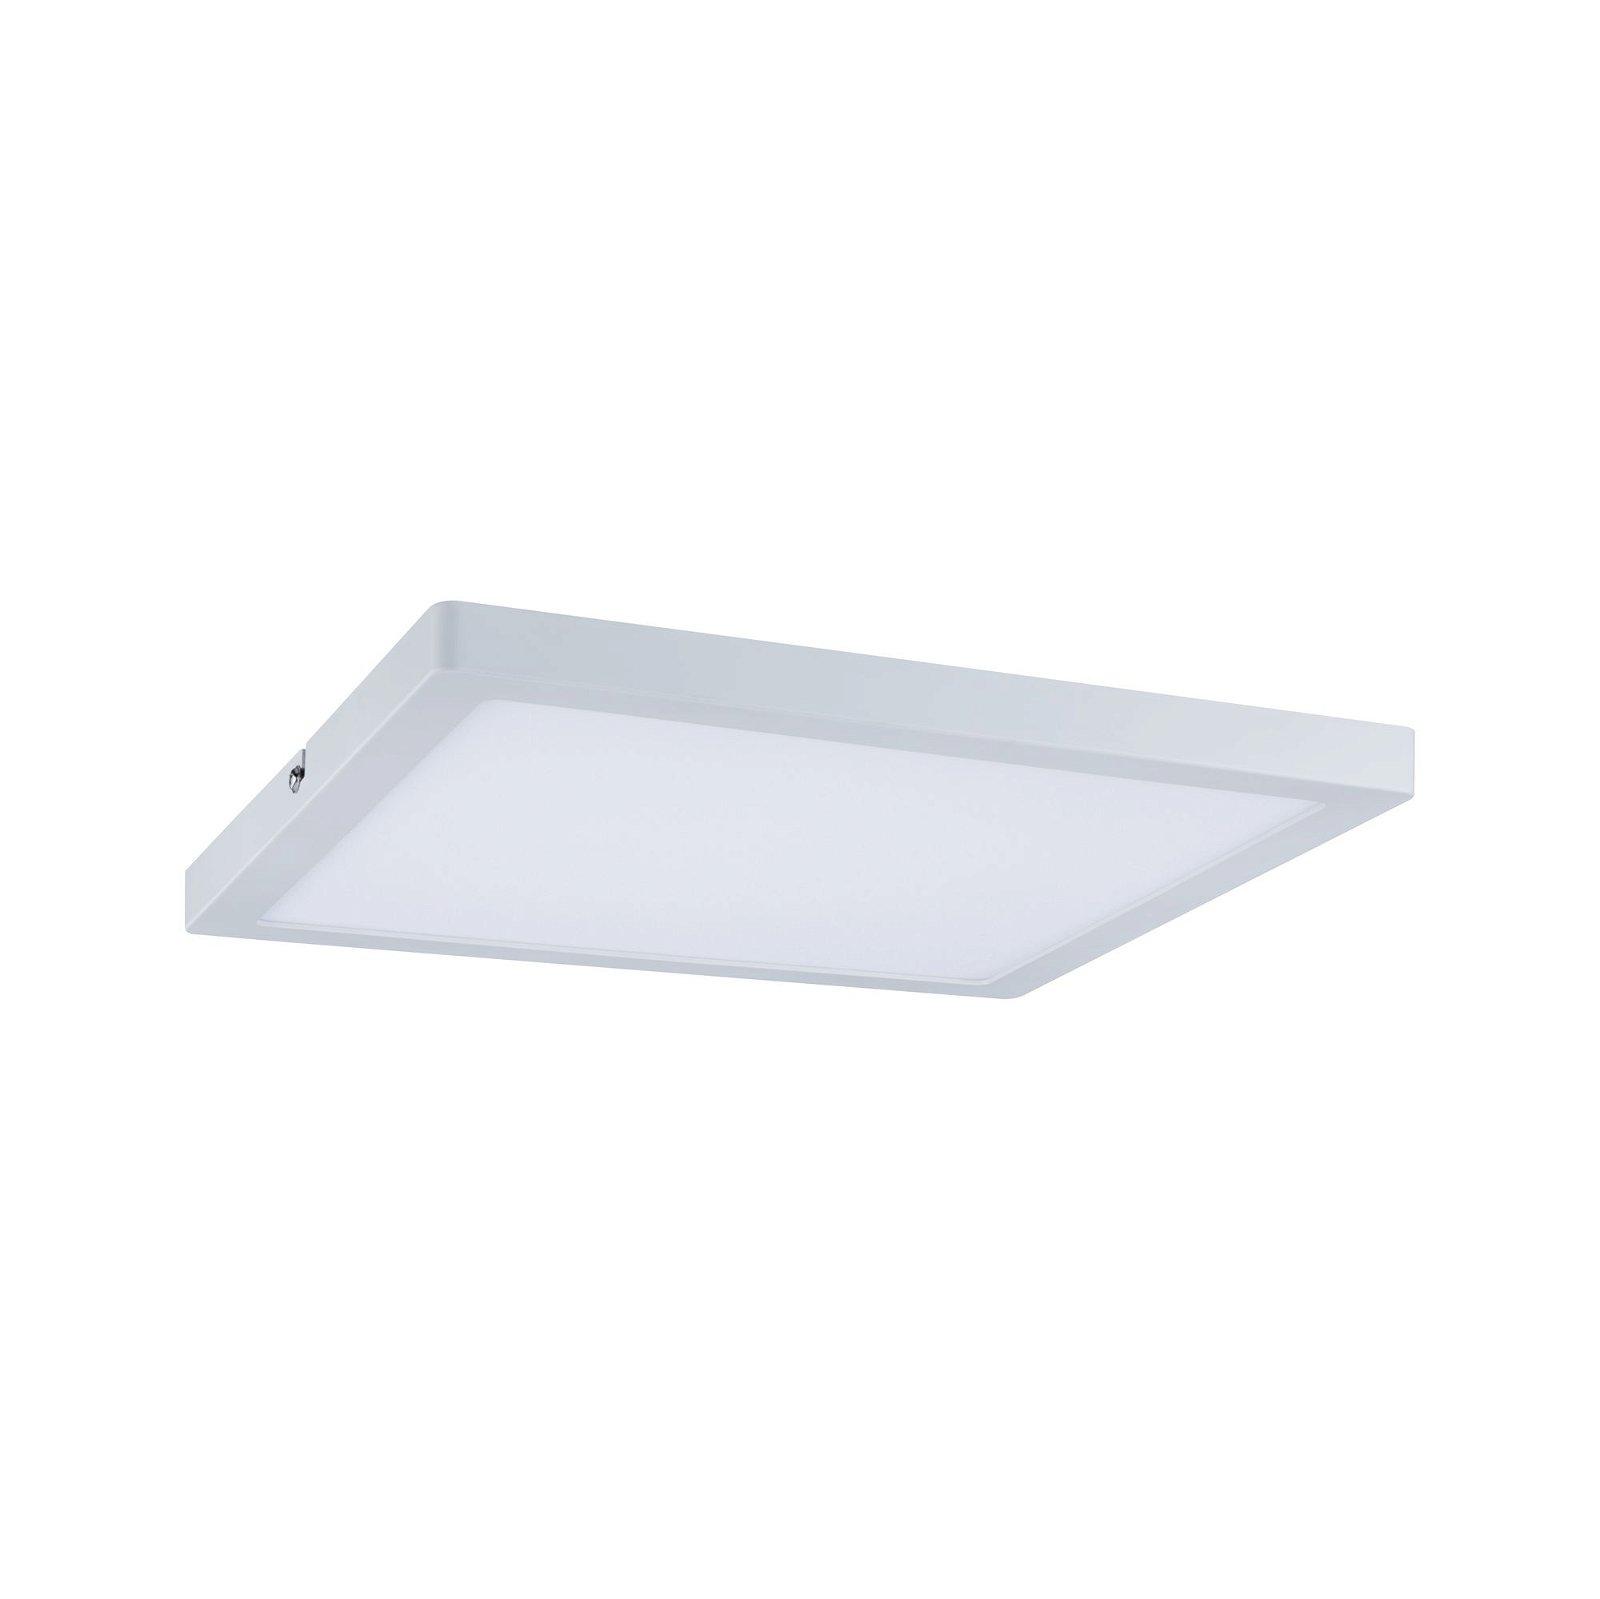 Panneau LED Atria carré 300x300mm 1800lm 4000K Blanc dépoli